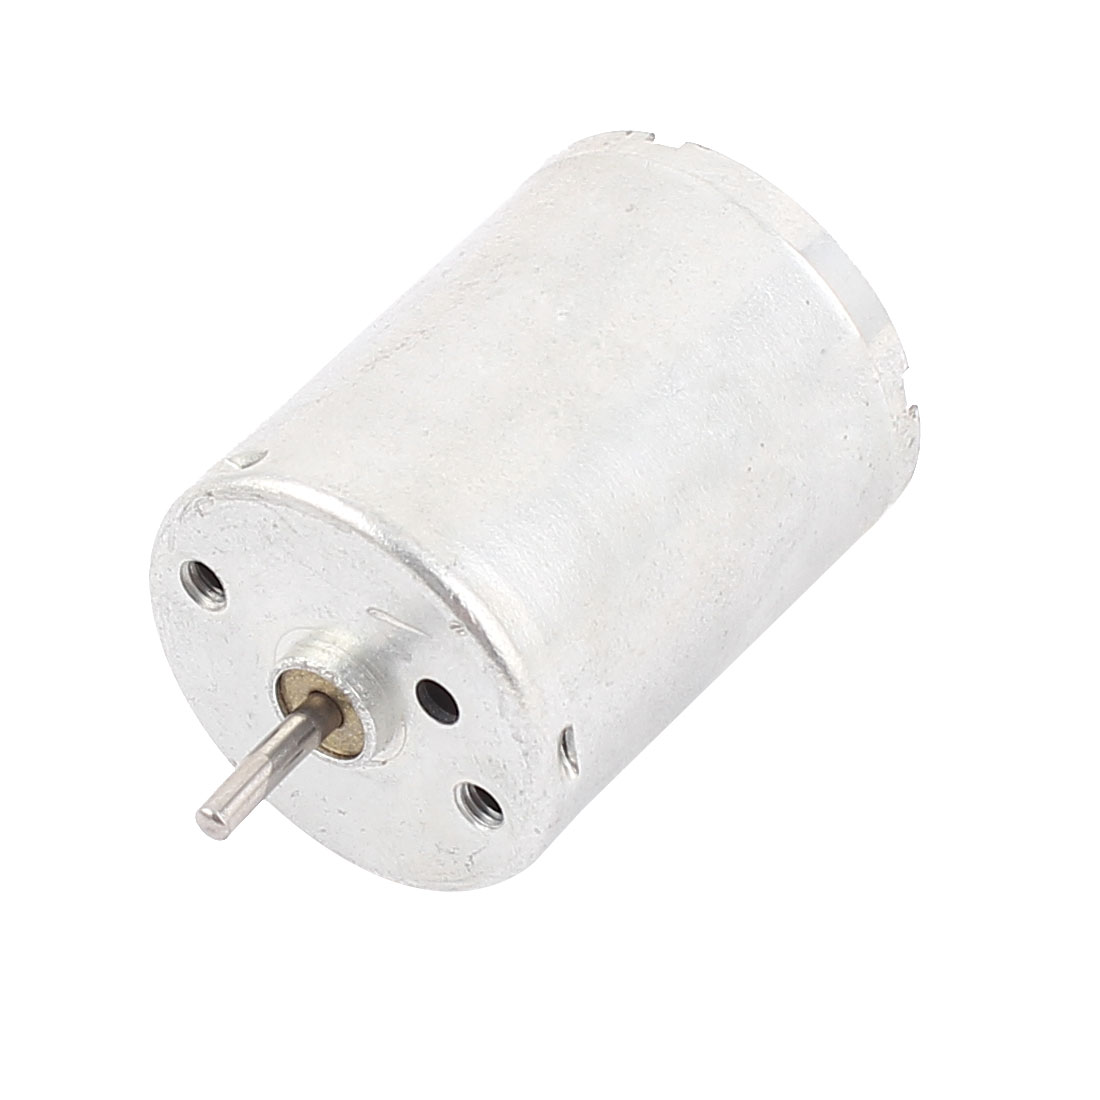 DC 6V 22000RPM Cylinder Shaped Miniature Vibration Motor for DIY Toy Cars